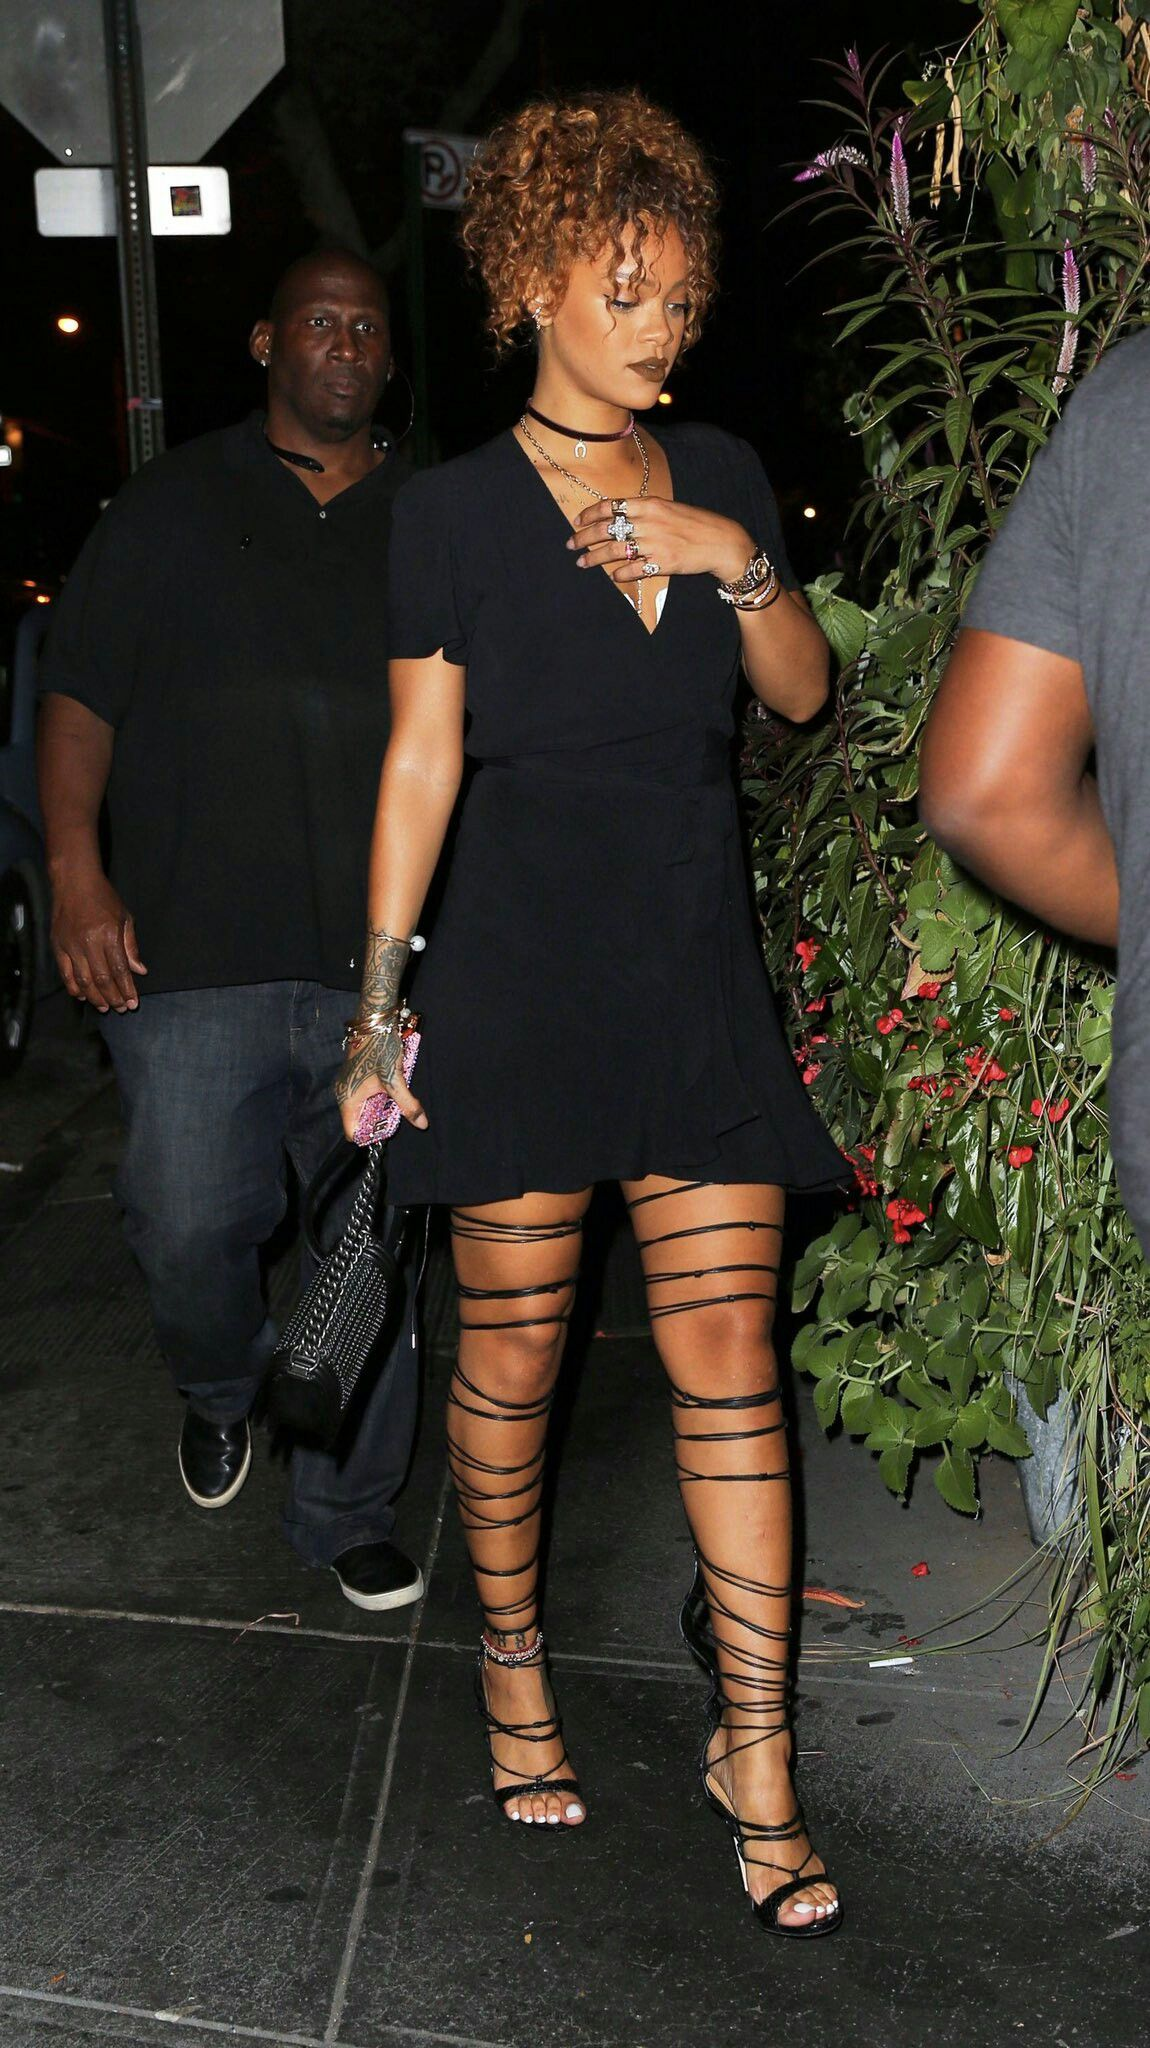 #Rihanna #street style | Rihanna looks